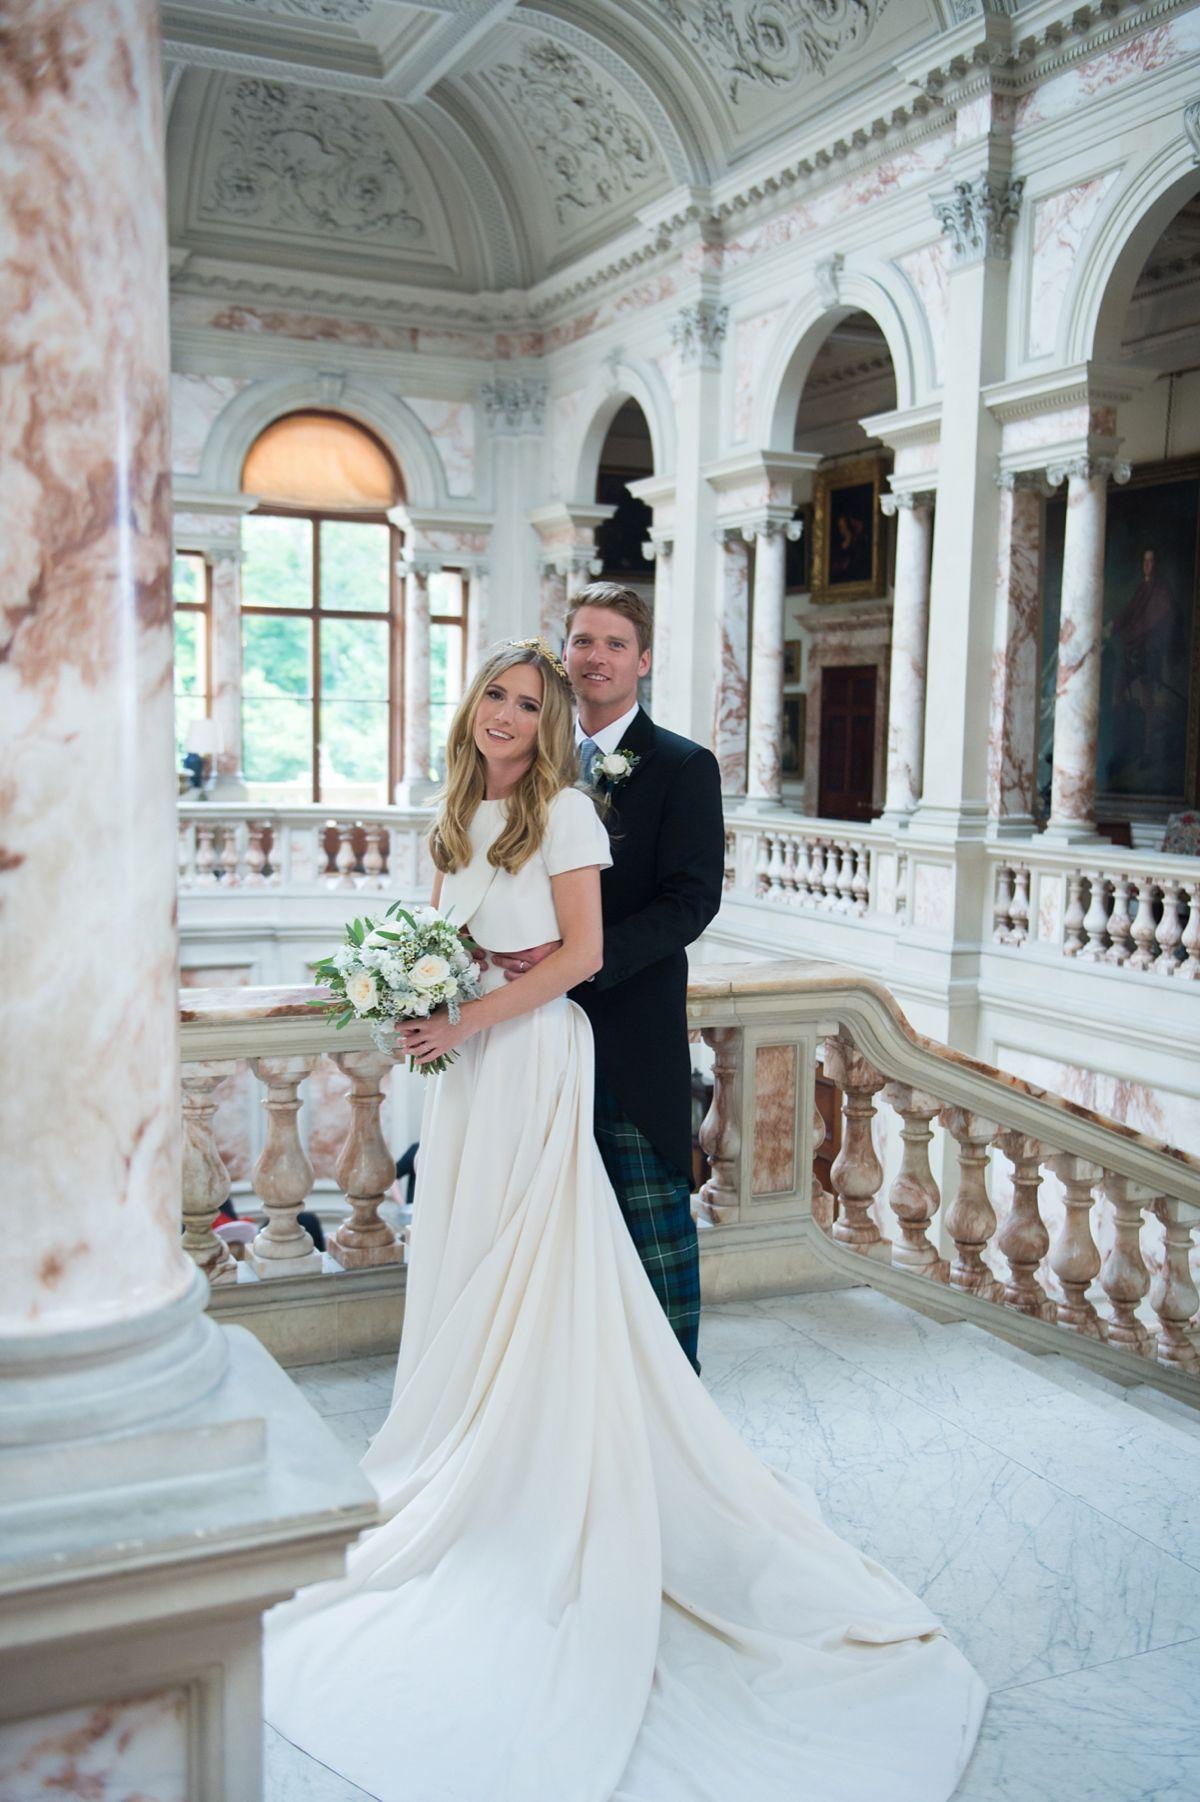 Scottish wedding dresses  An Elizabeth Stuart Gown For A Grand Scottish Wedding  marry